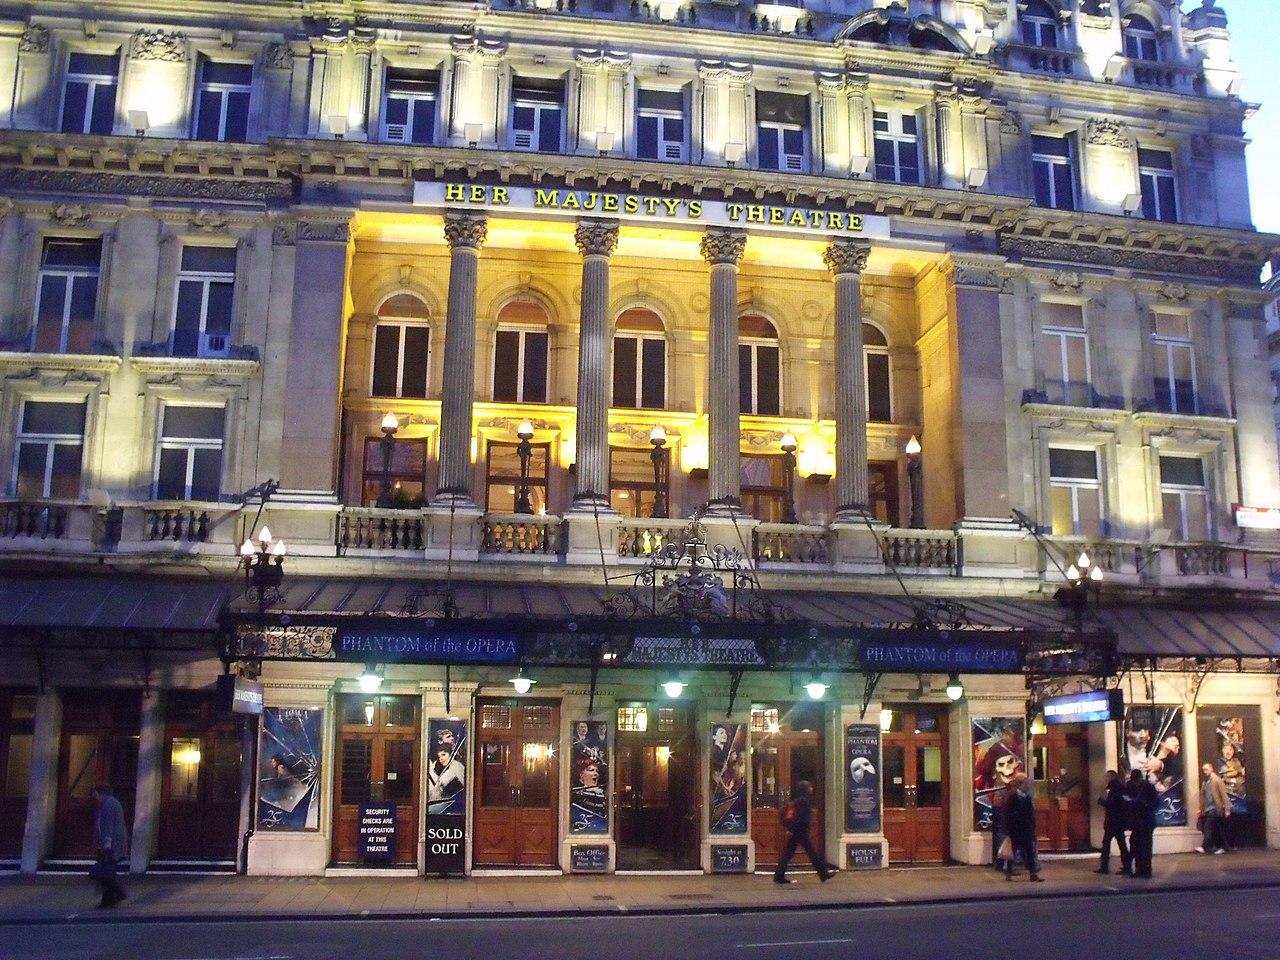 File:Her Majestys Theatre - Haymarket, London - The ...